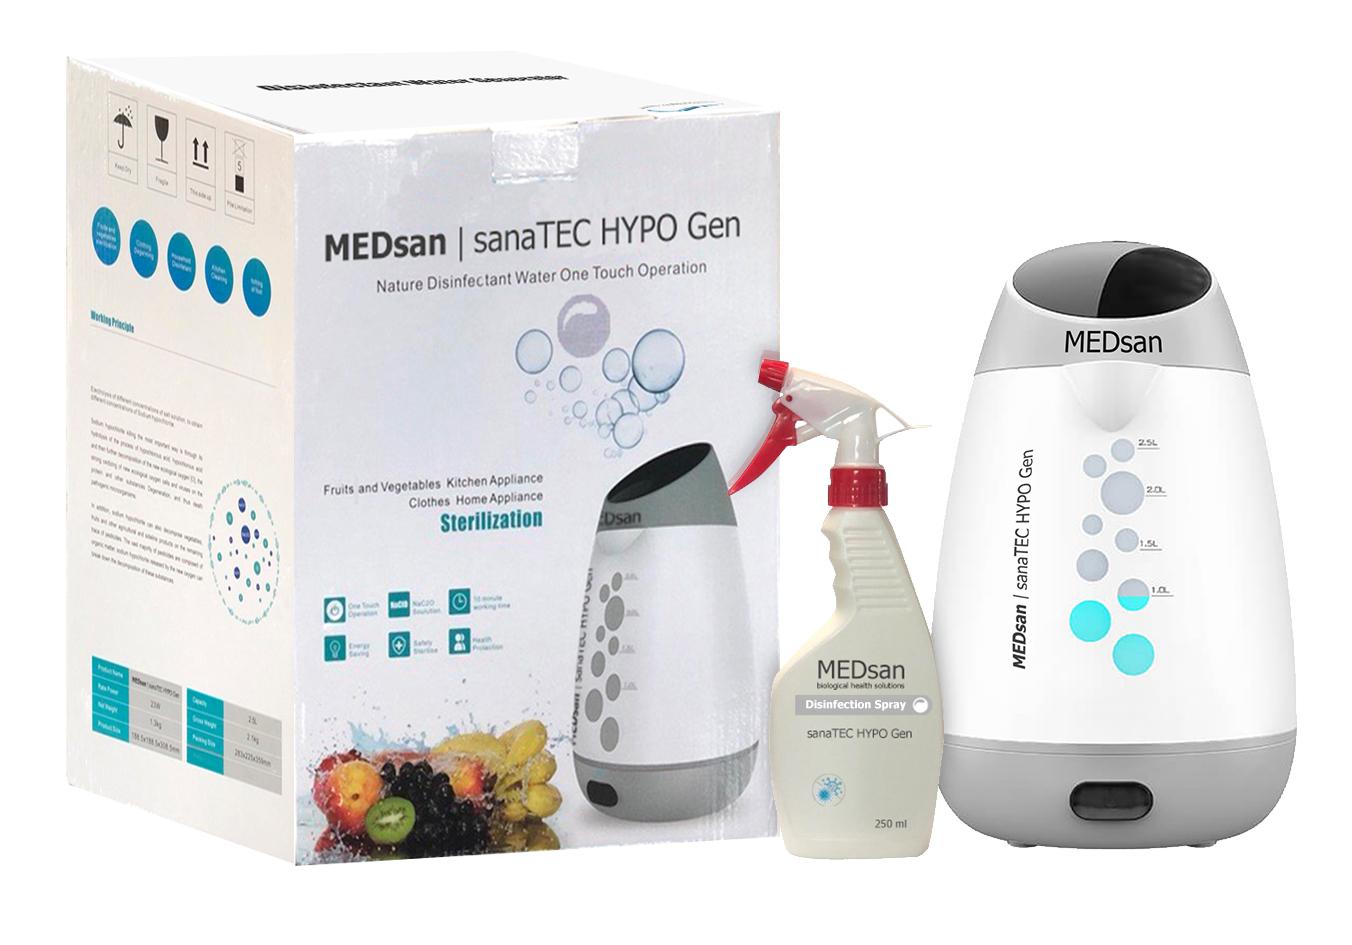 sanaTEC HYPO Gen - Homemade Disinfection